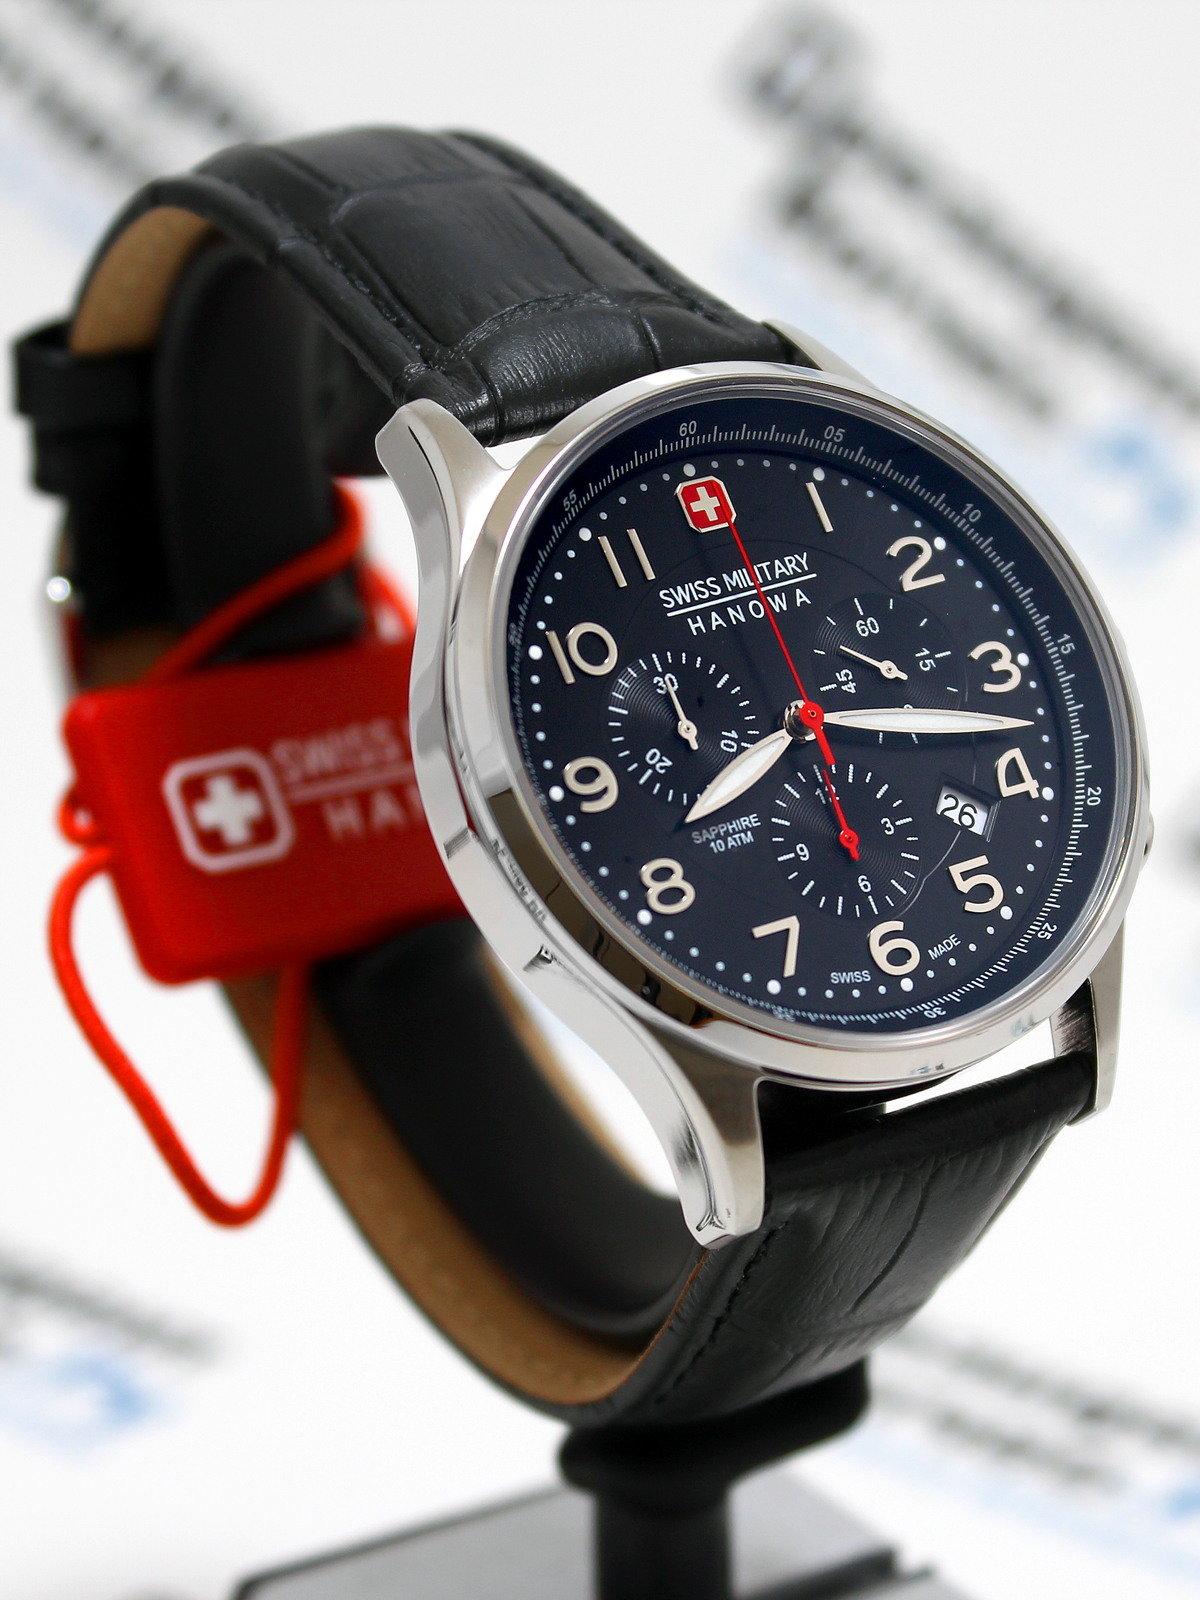 Часы OMAX since 1946 Quartz - omax-msk.ru